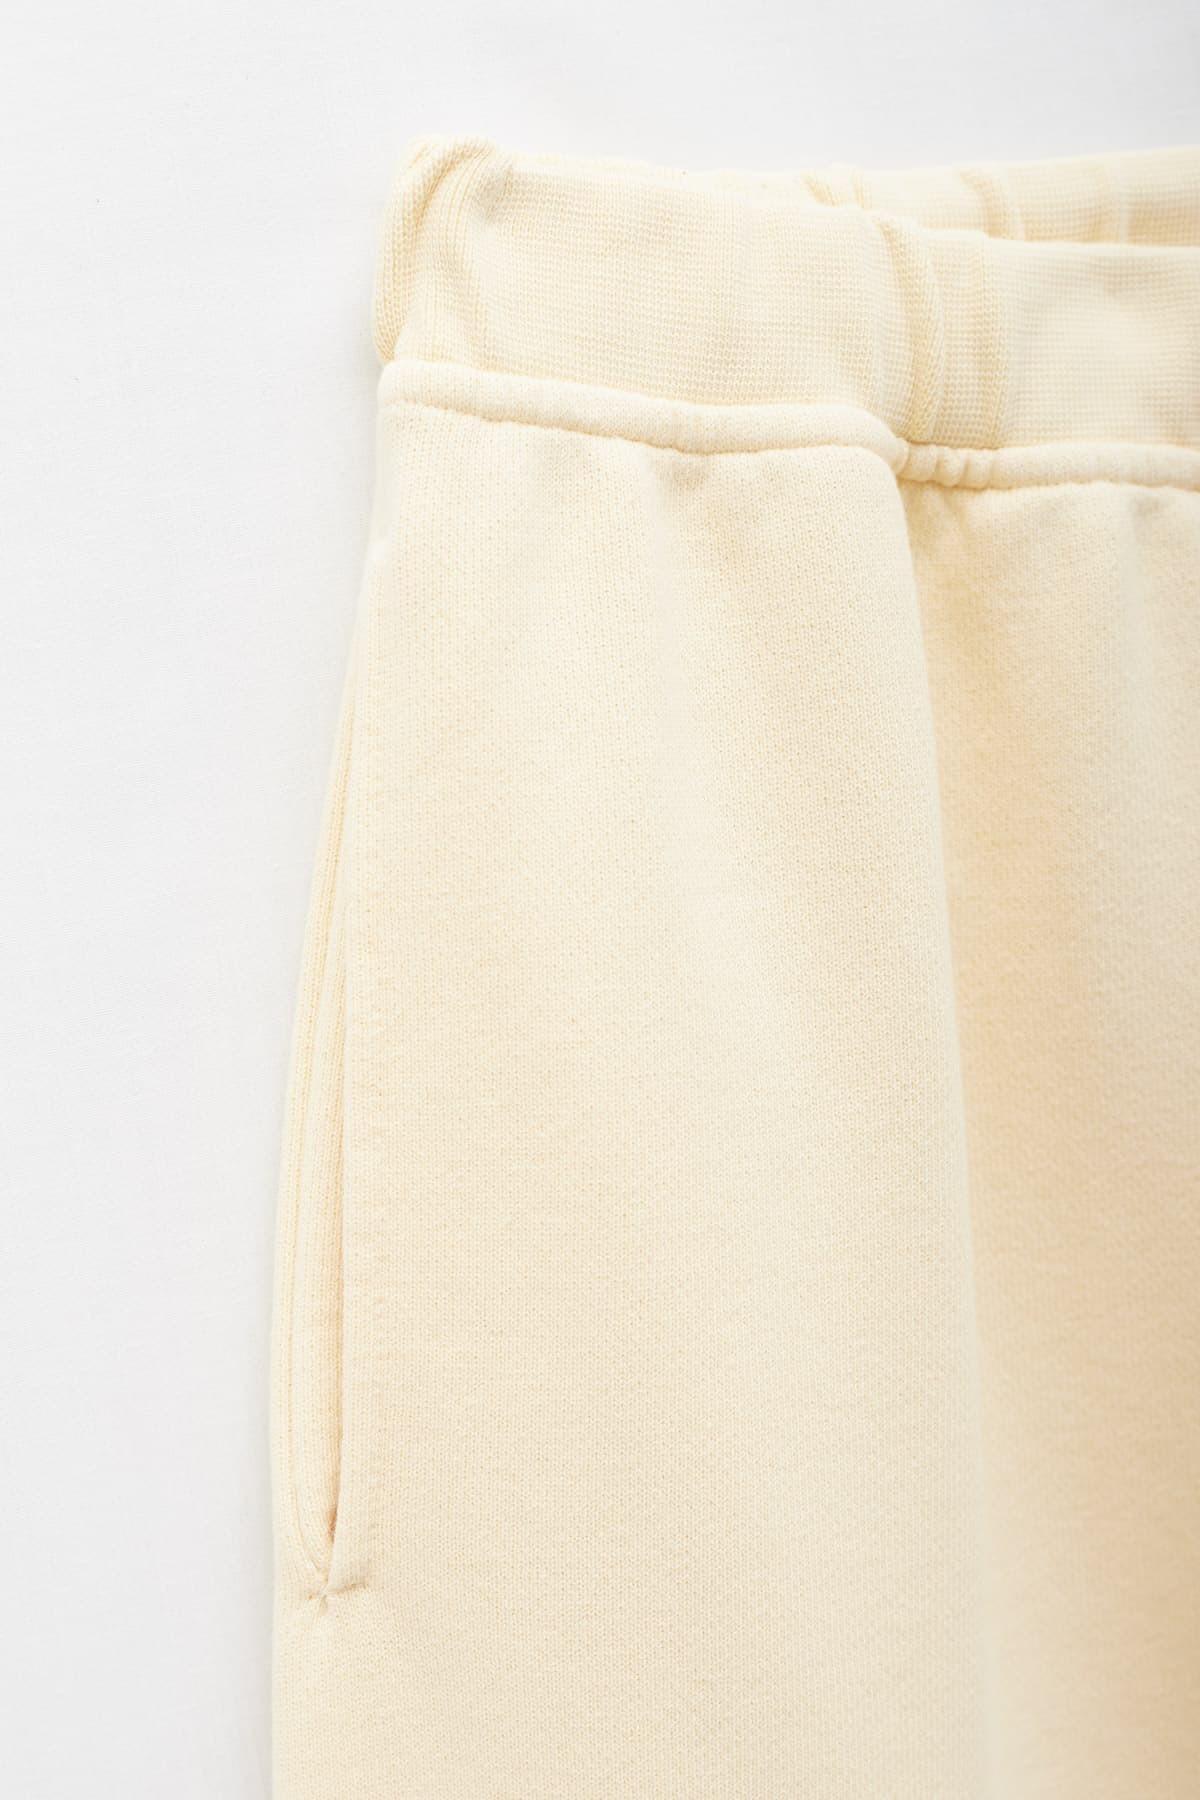 Acne Studios Black Card Holder Flap Wallet